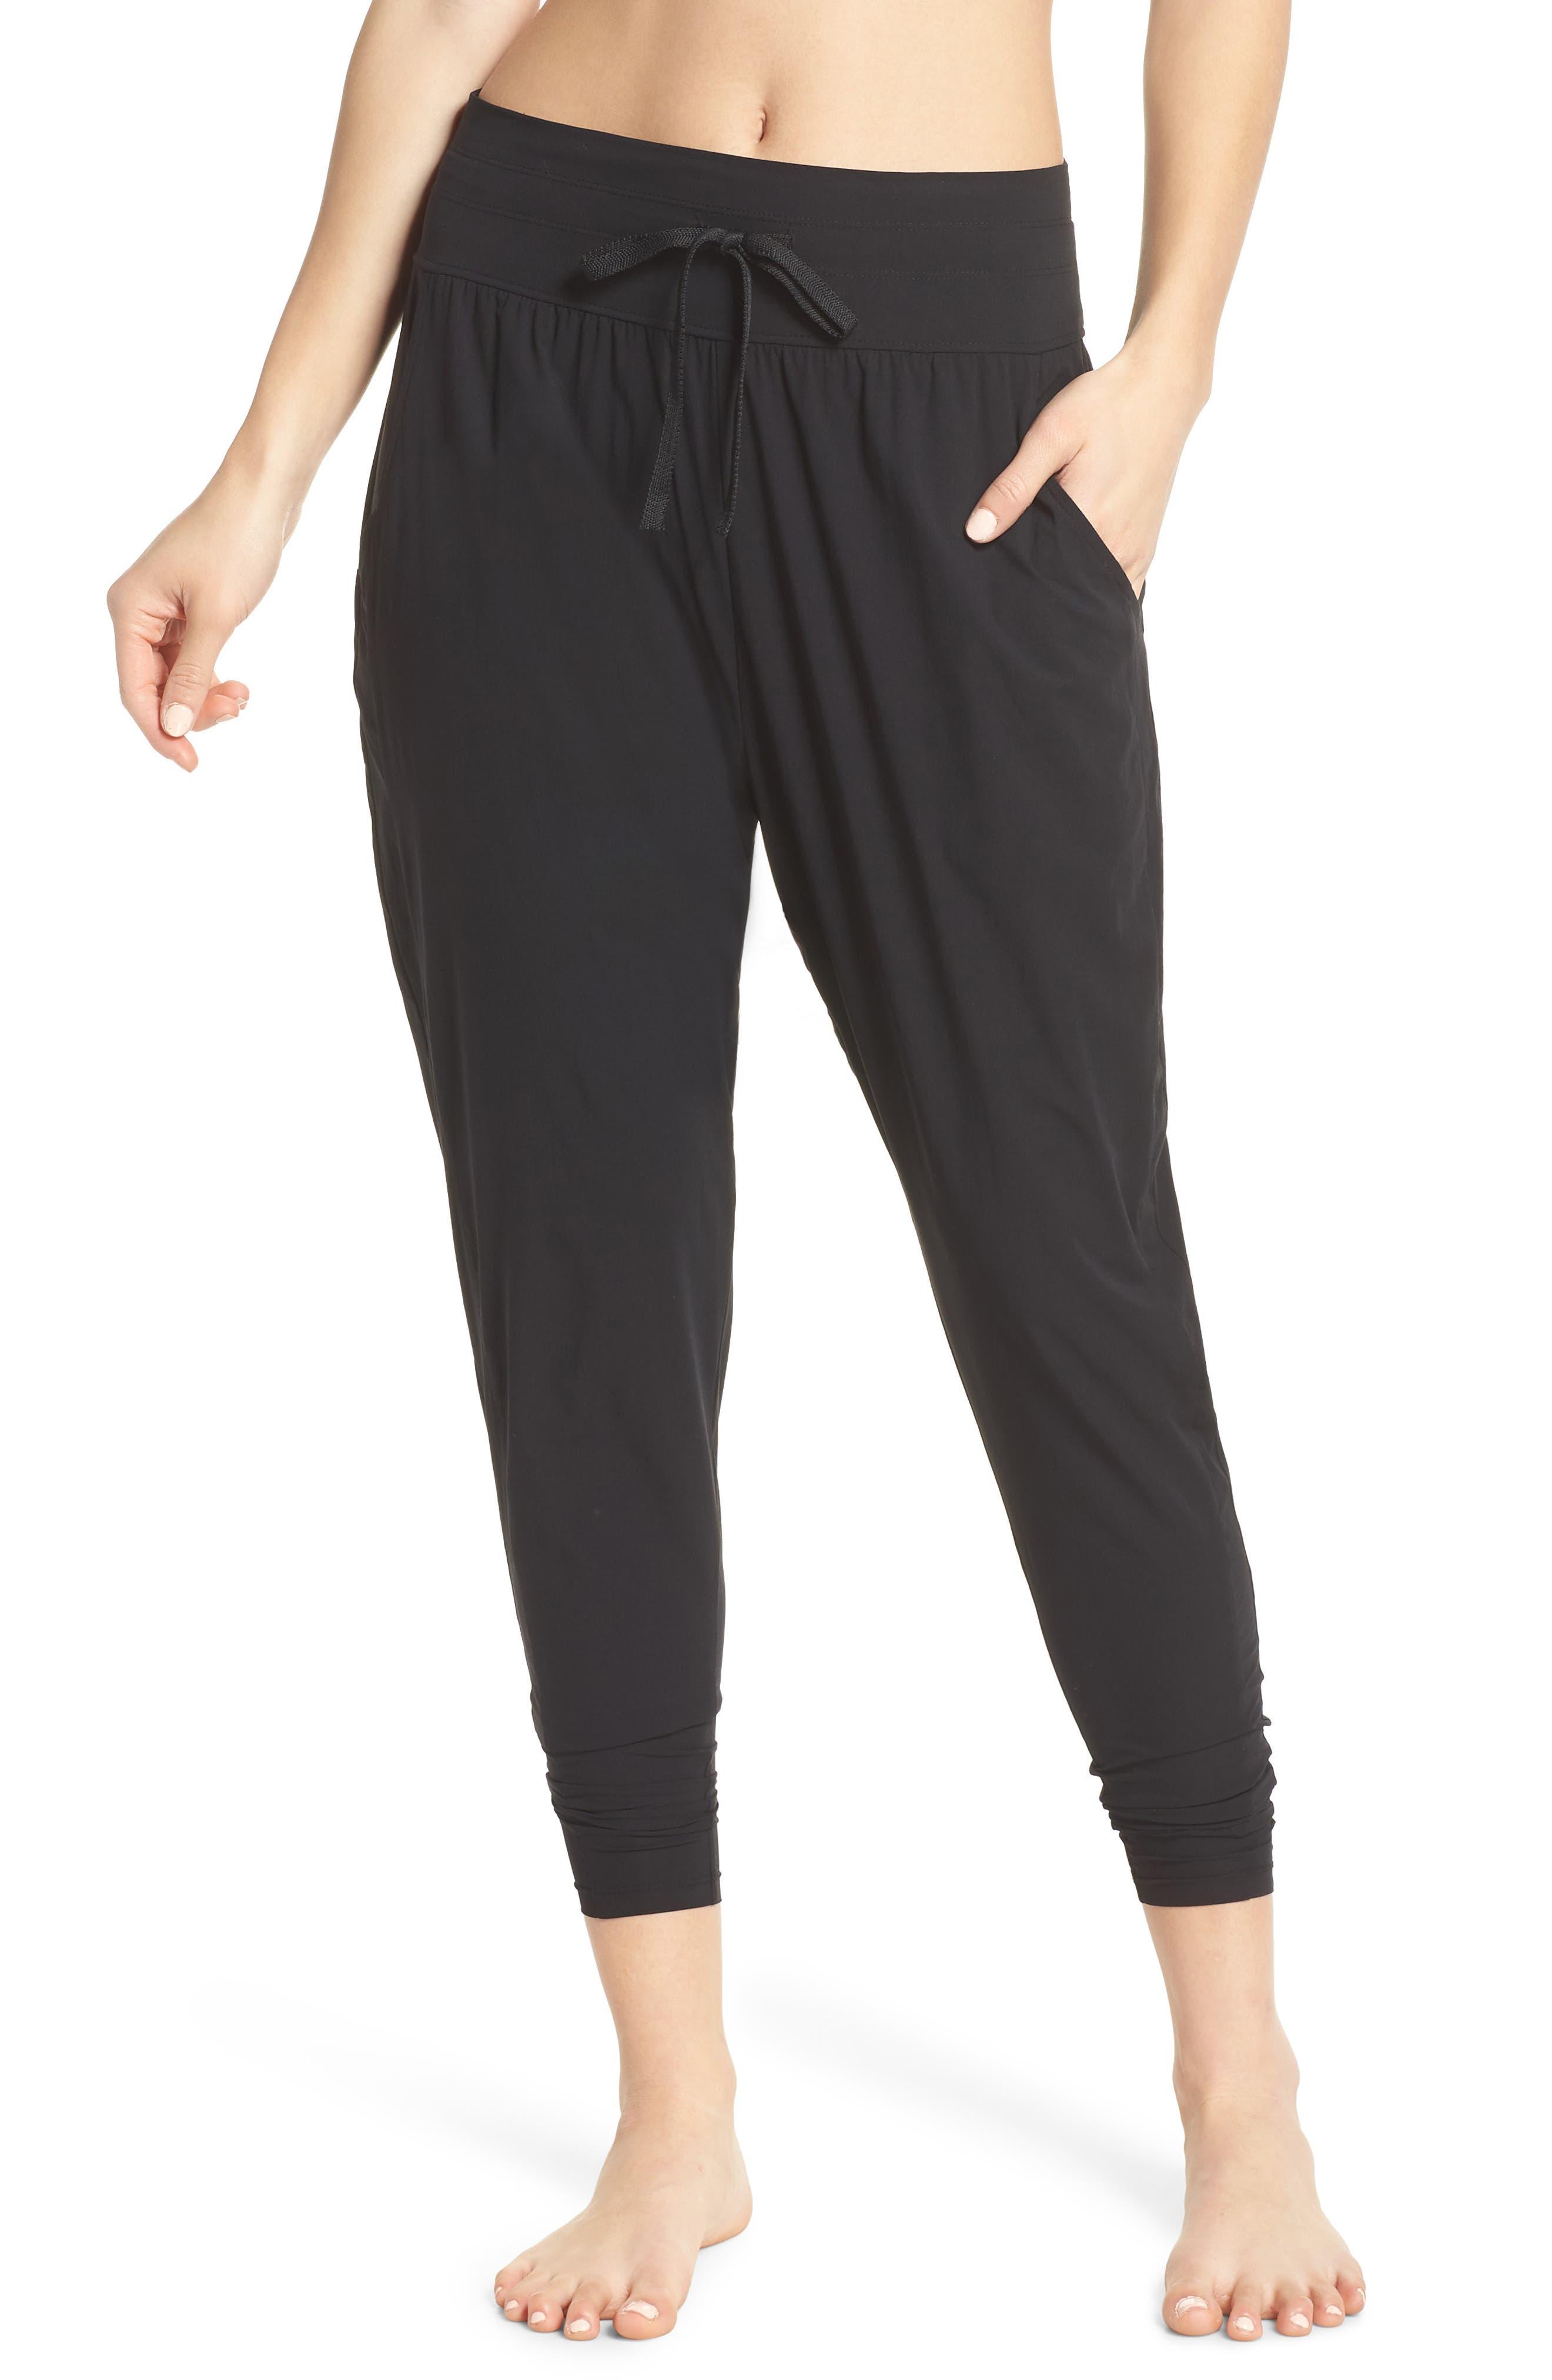 Cardio Harem Pants,                             Main thumbnail 1, color,                             Black